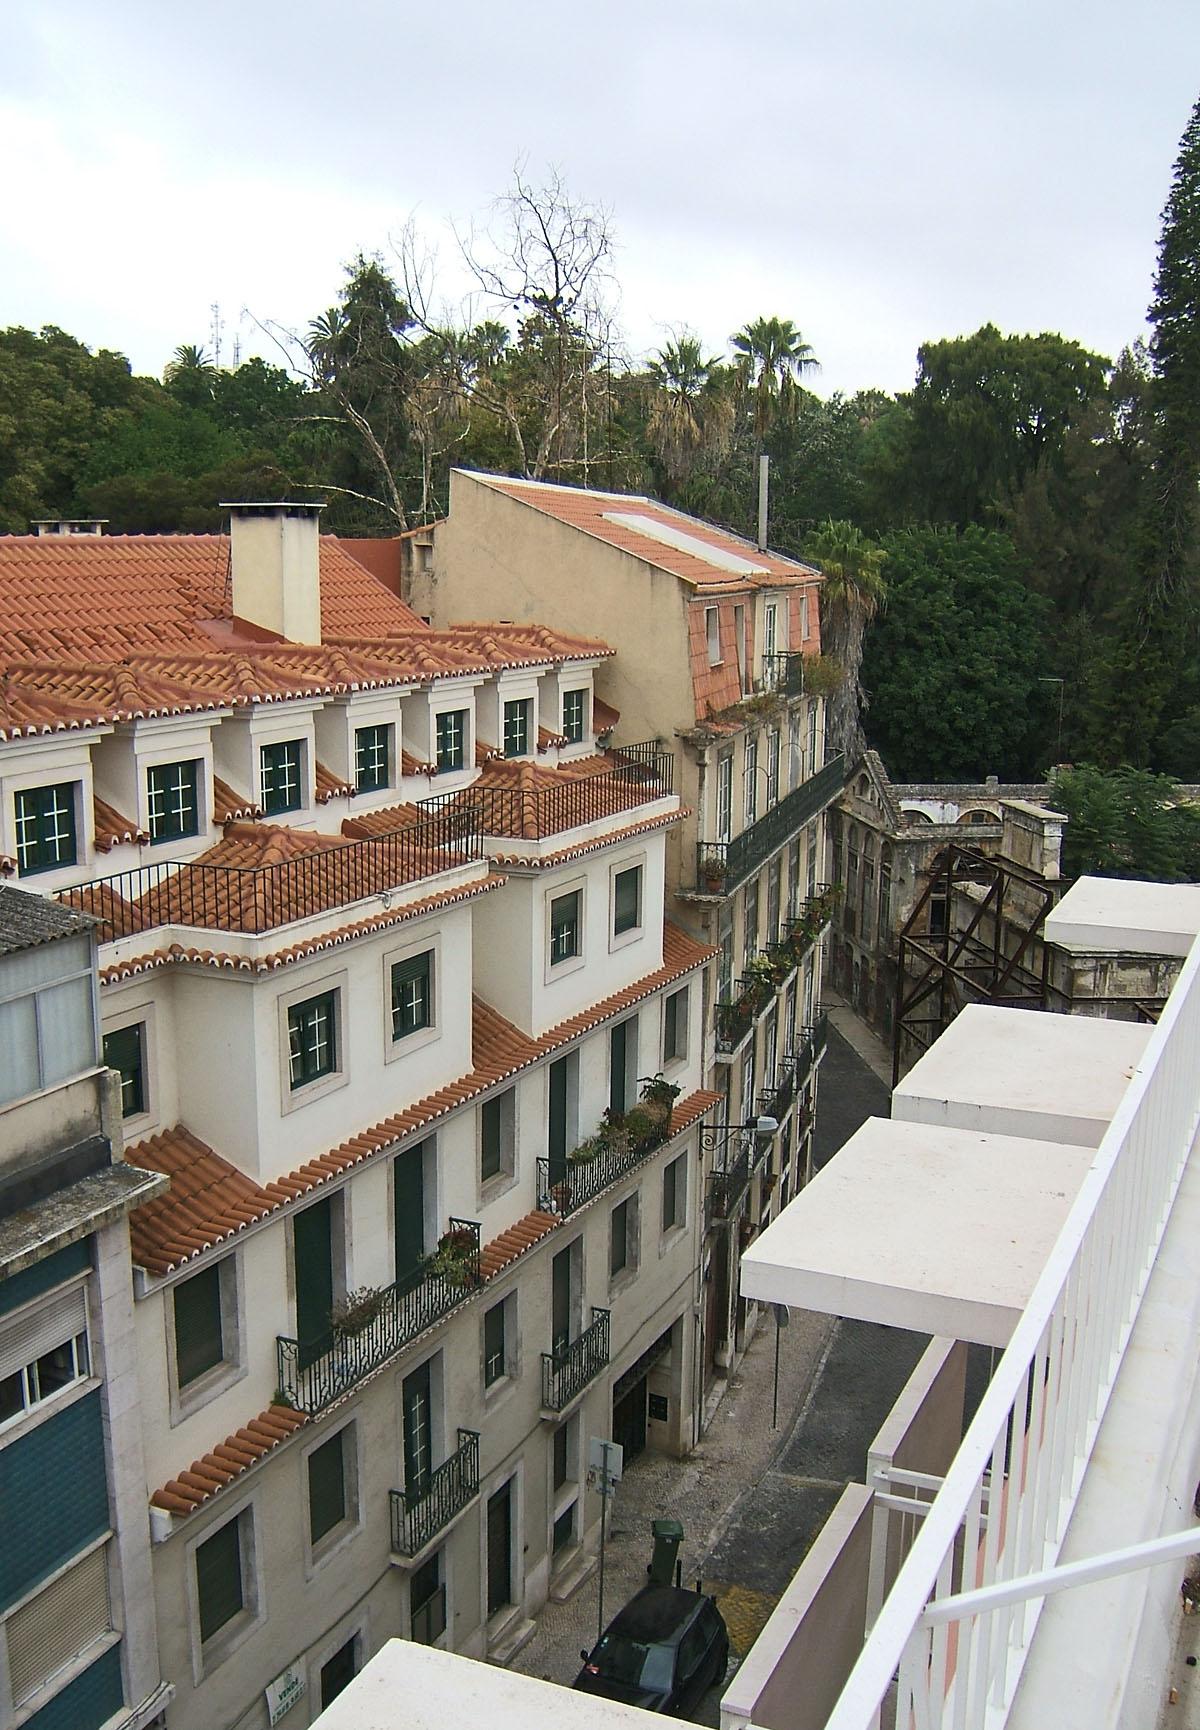 LisbonHotelView